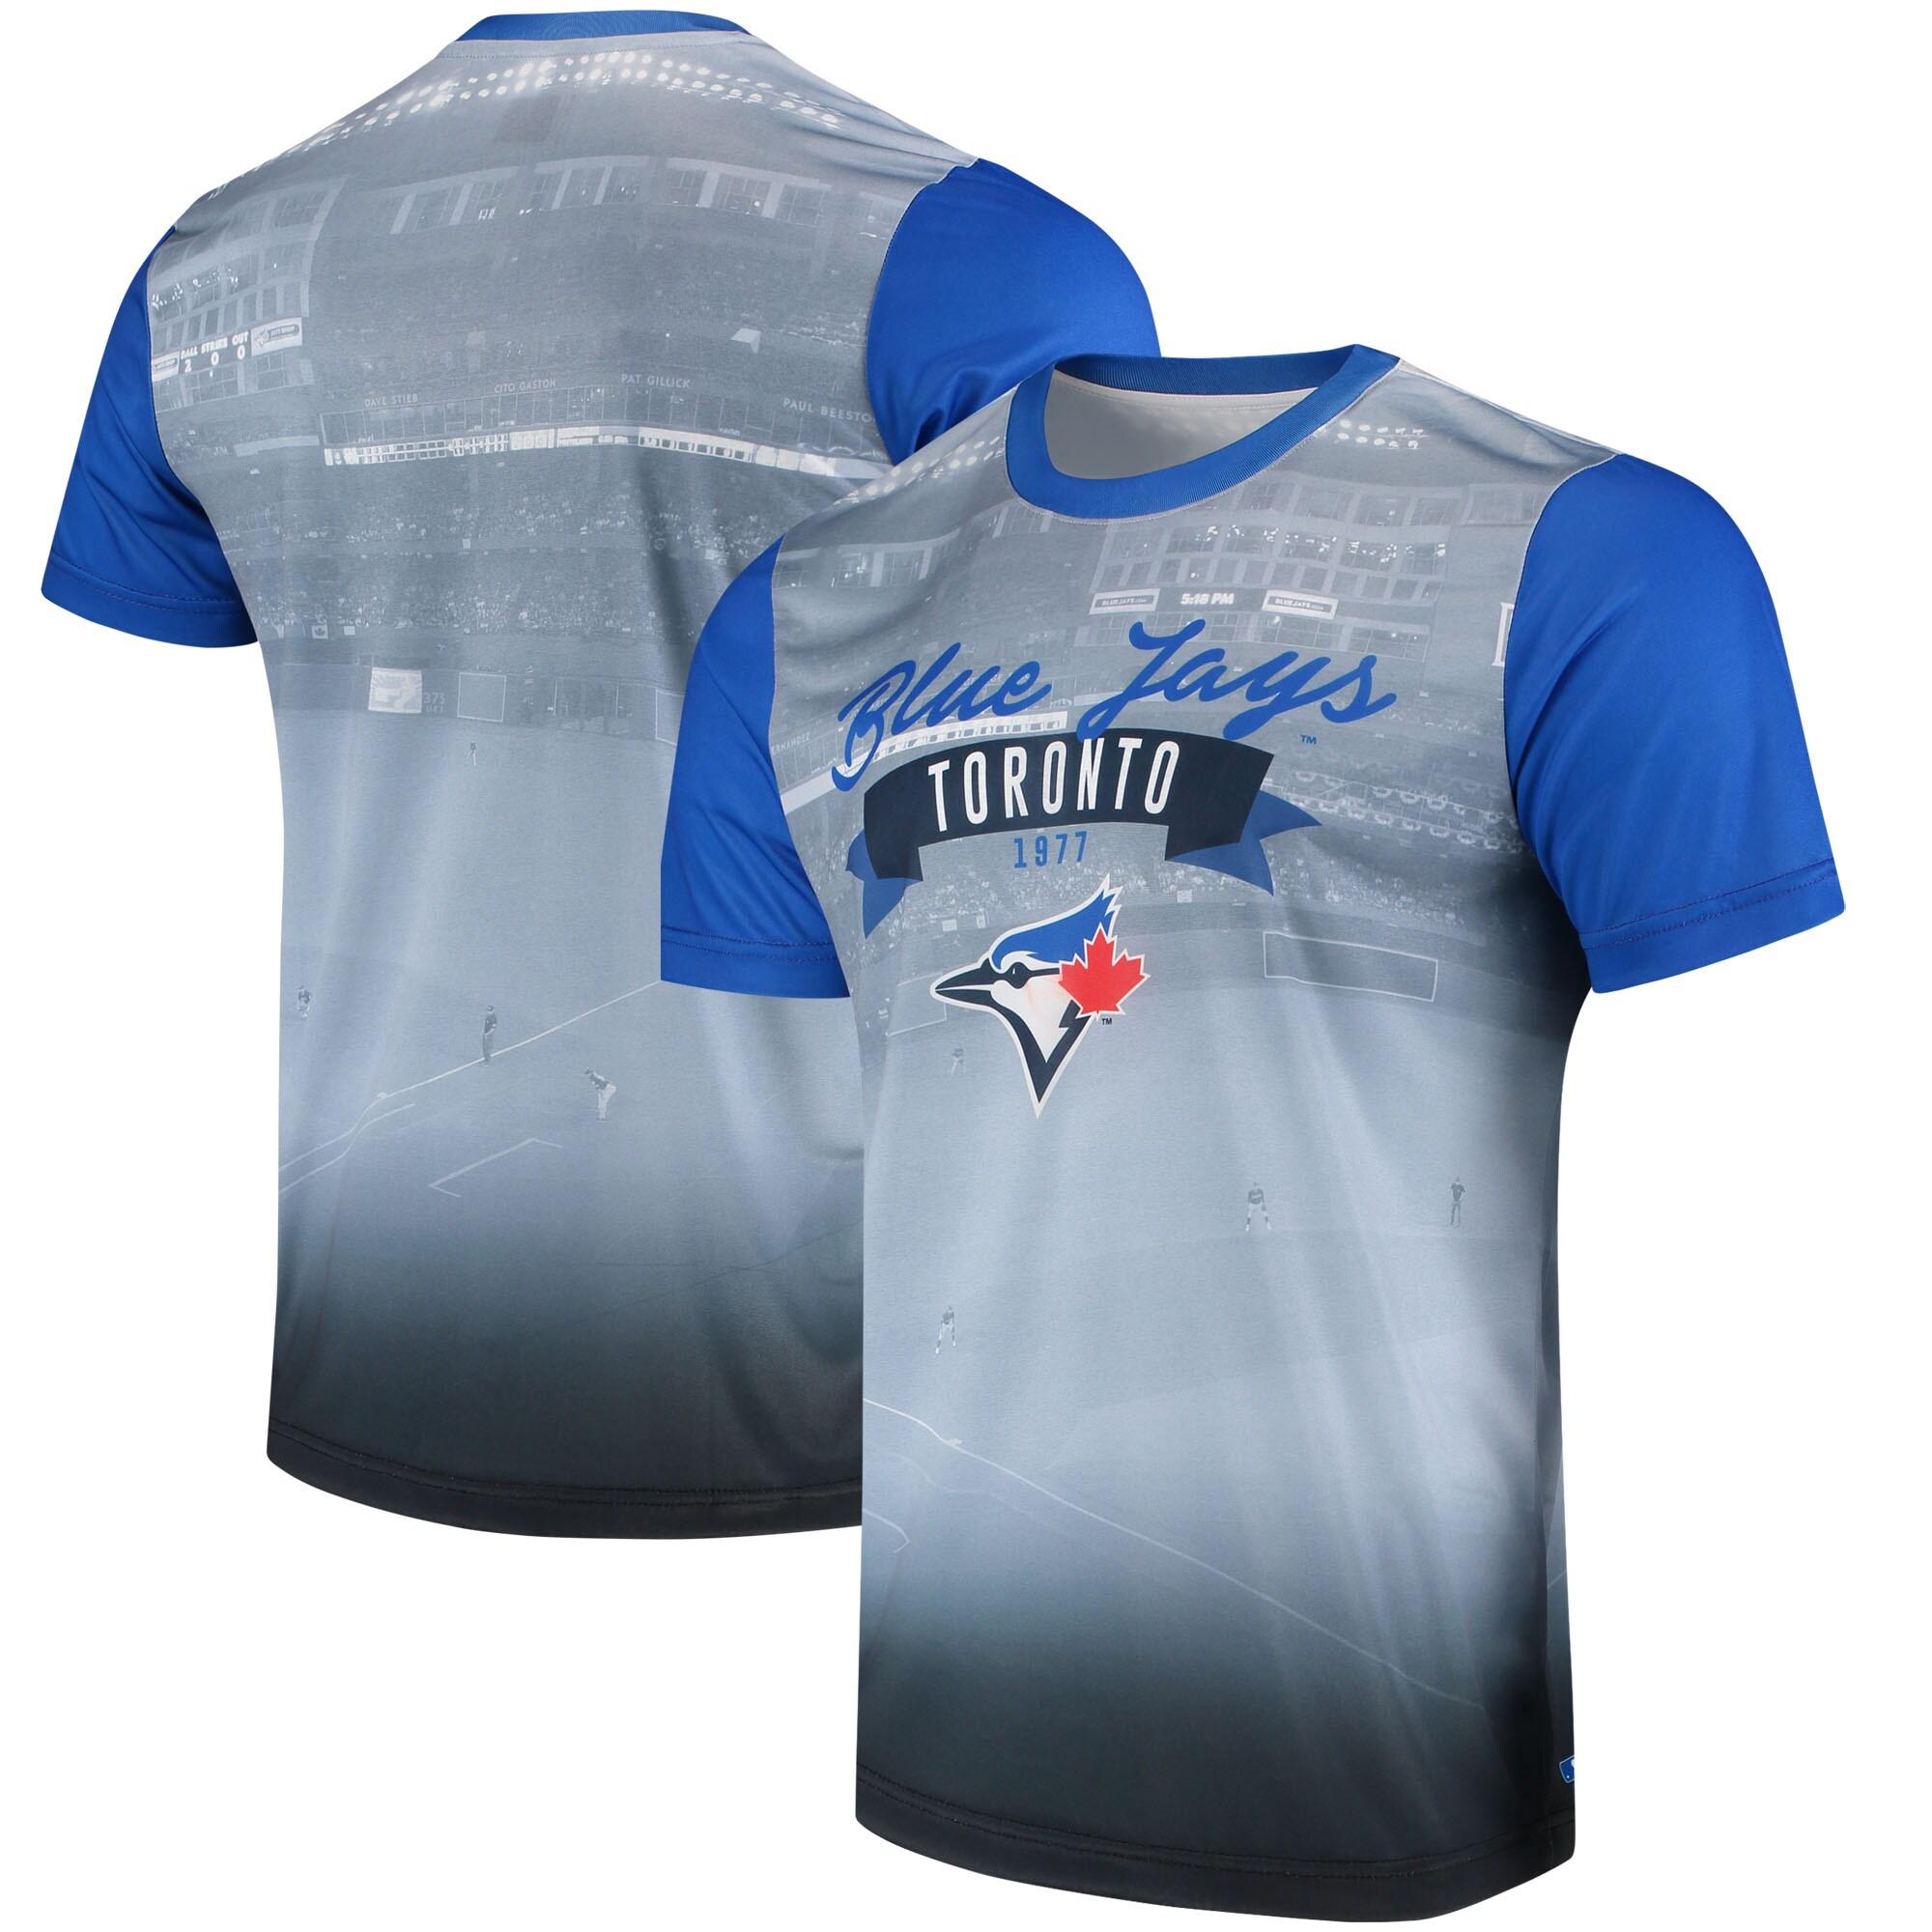 Toronto Blue Jays Outfield Photo T-Shirt - White/Royal